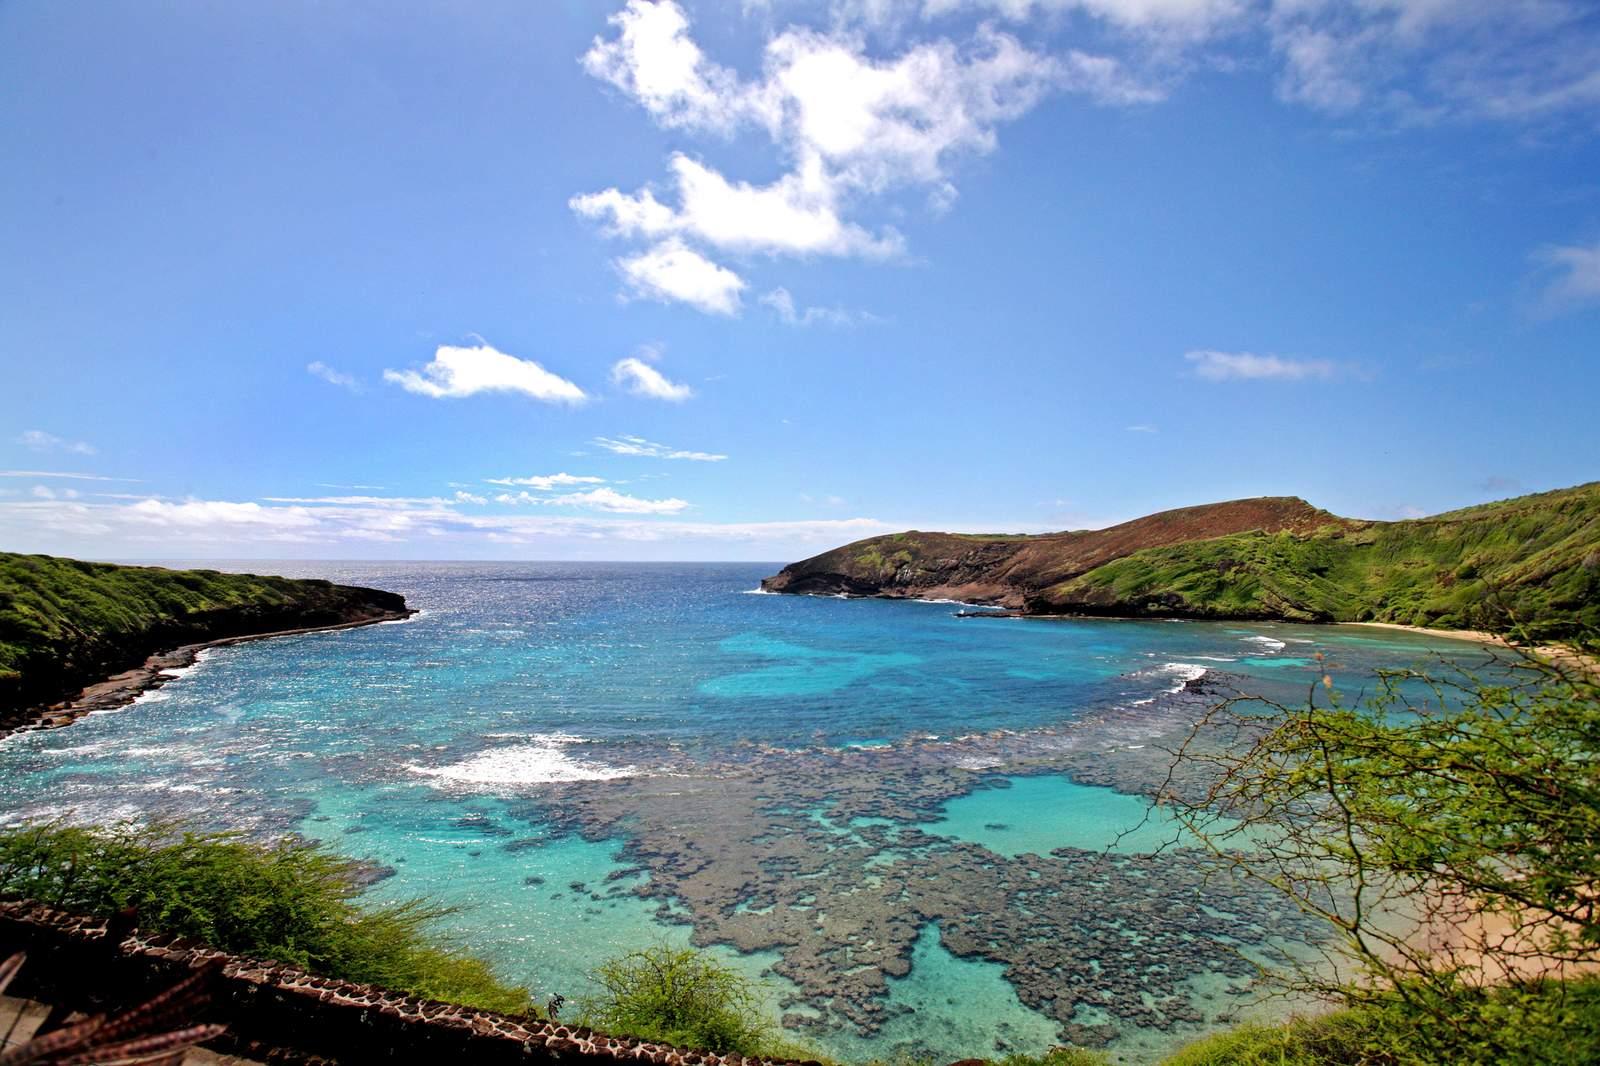 Hanauma Bay, Schnorchelbucht auf Oahu